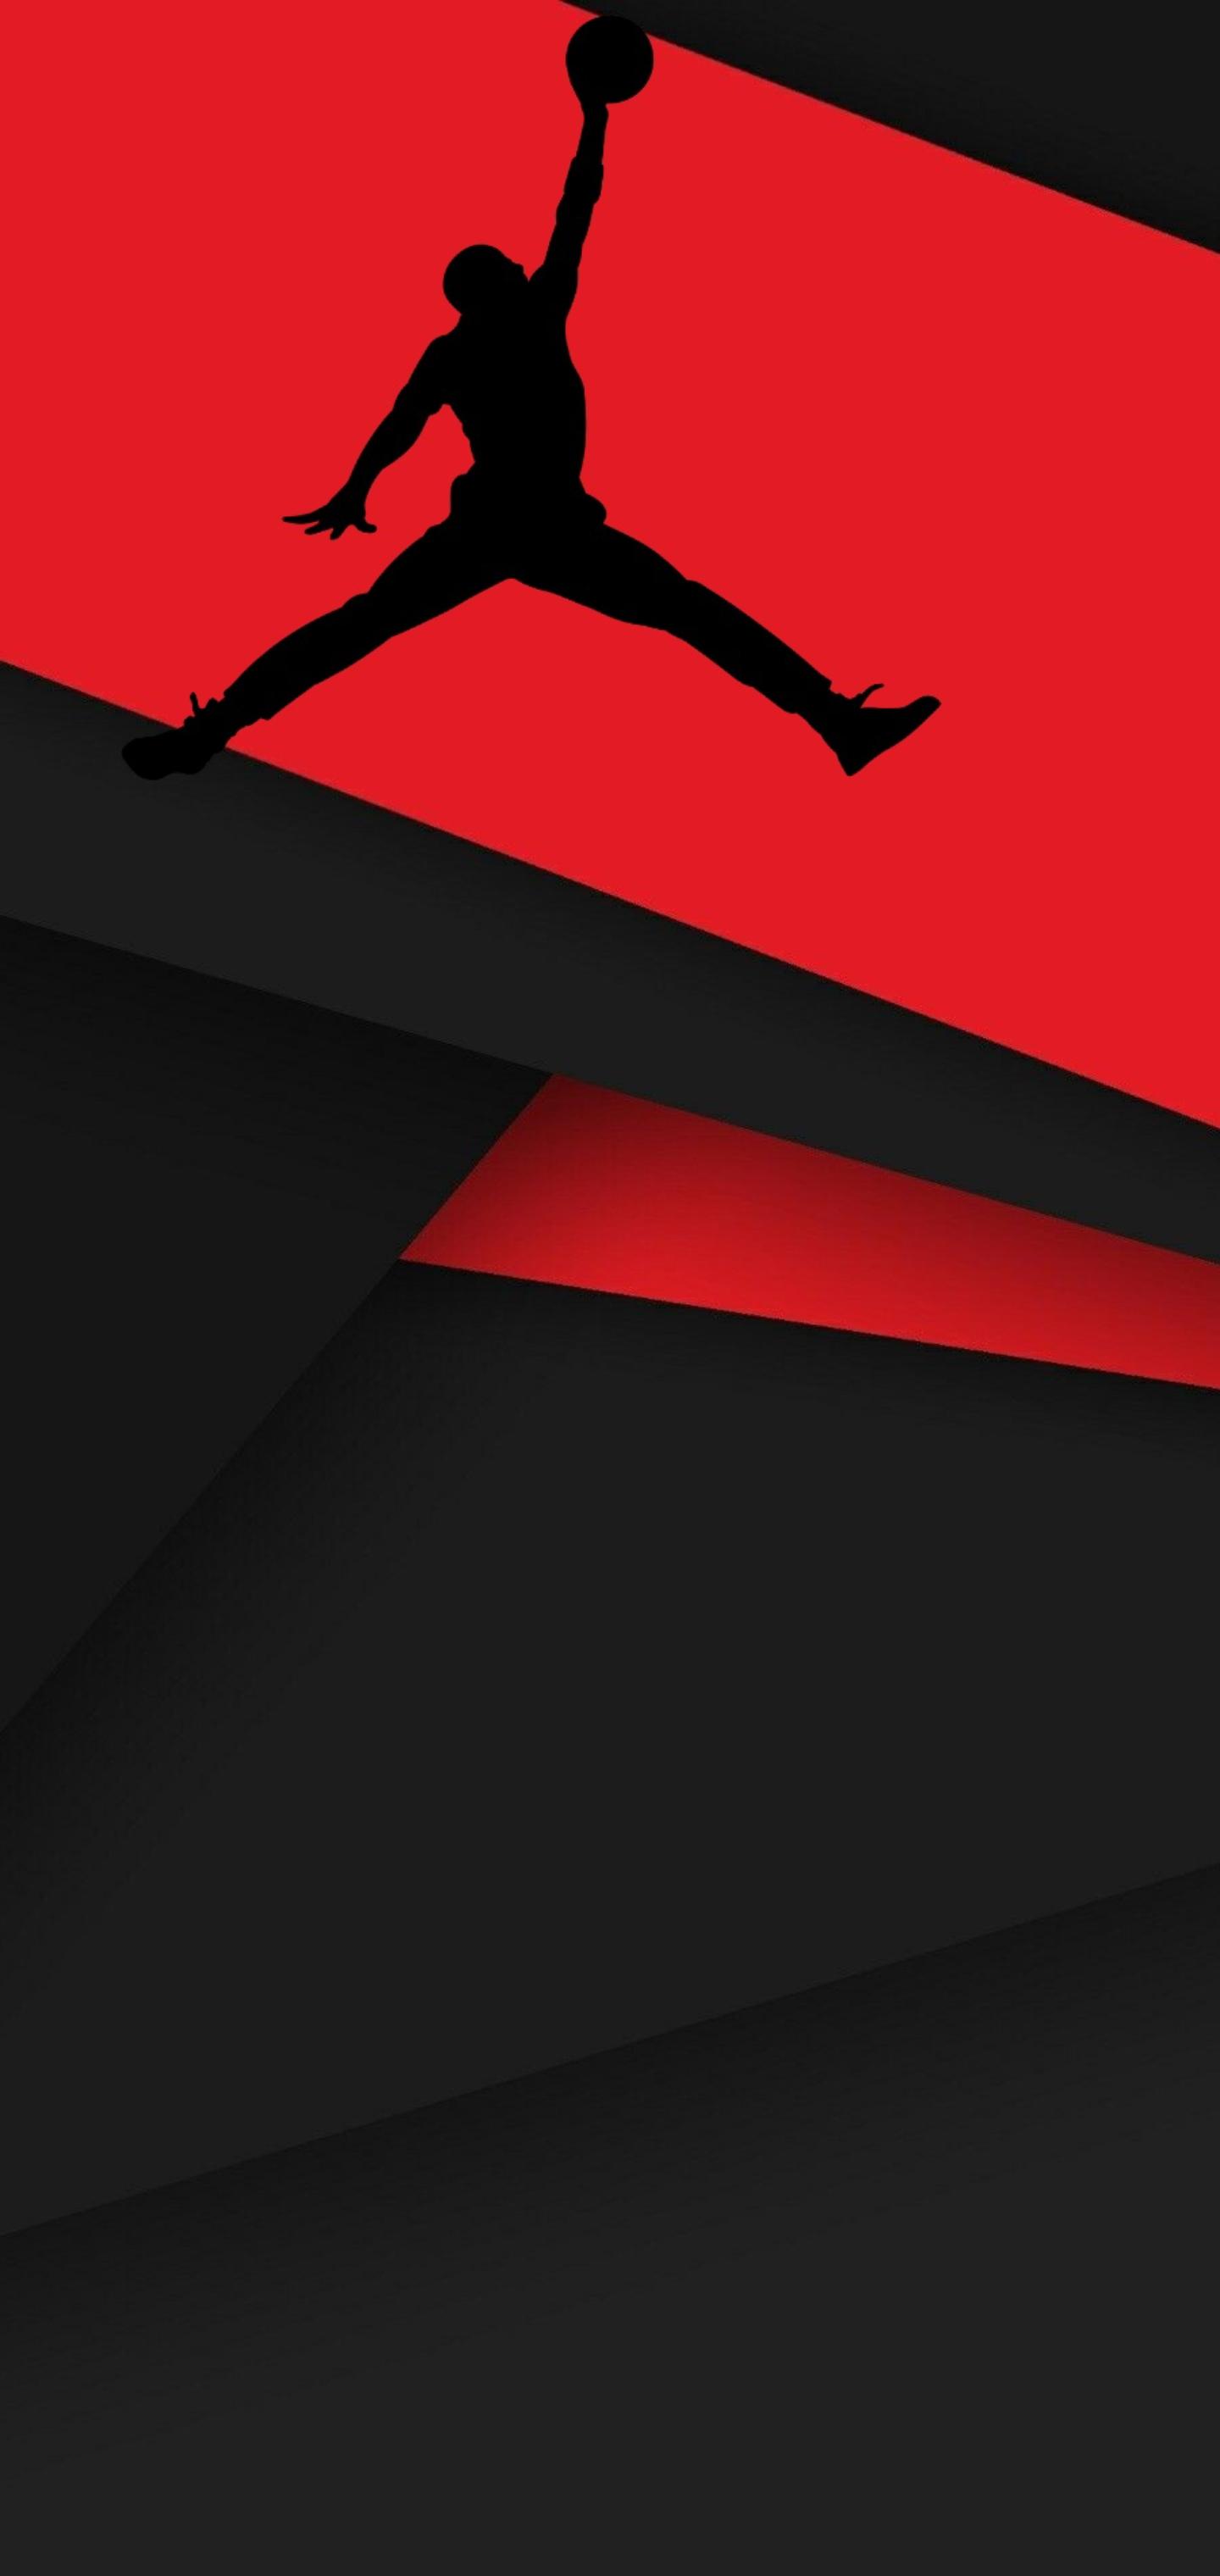 İordaniya - Note 10 Plus HD Divar kağızları